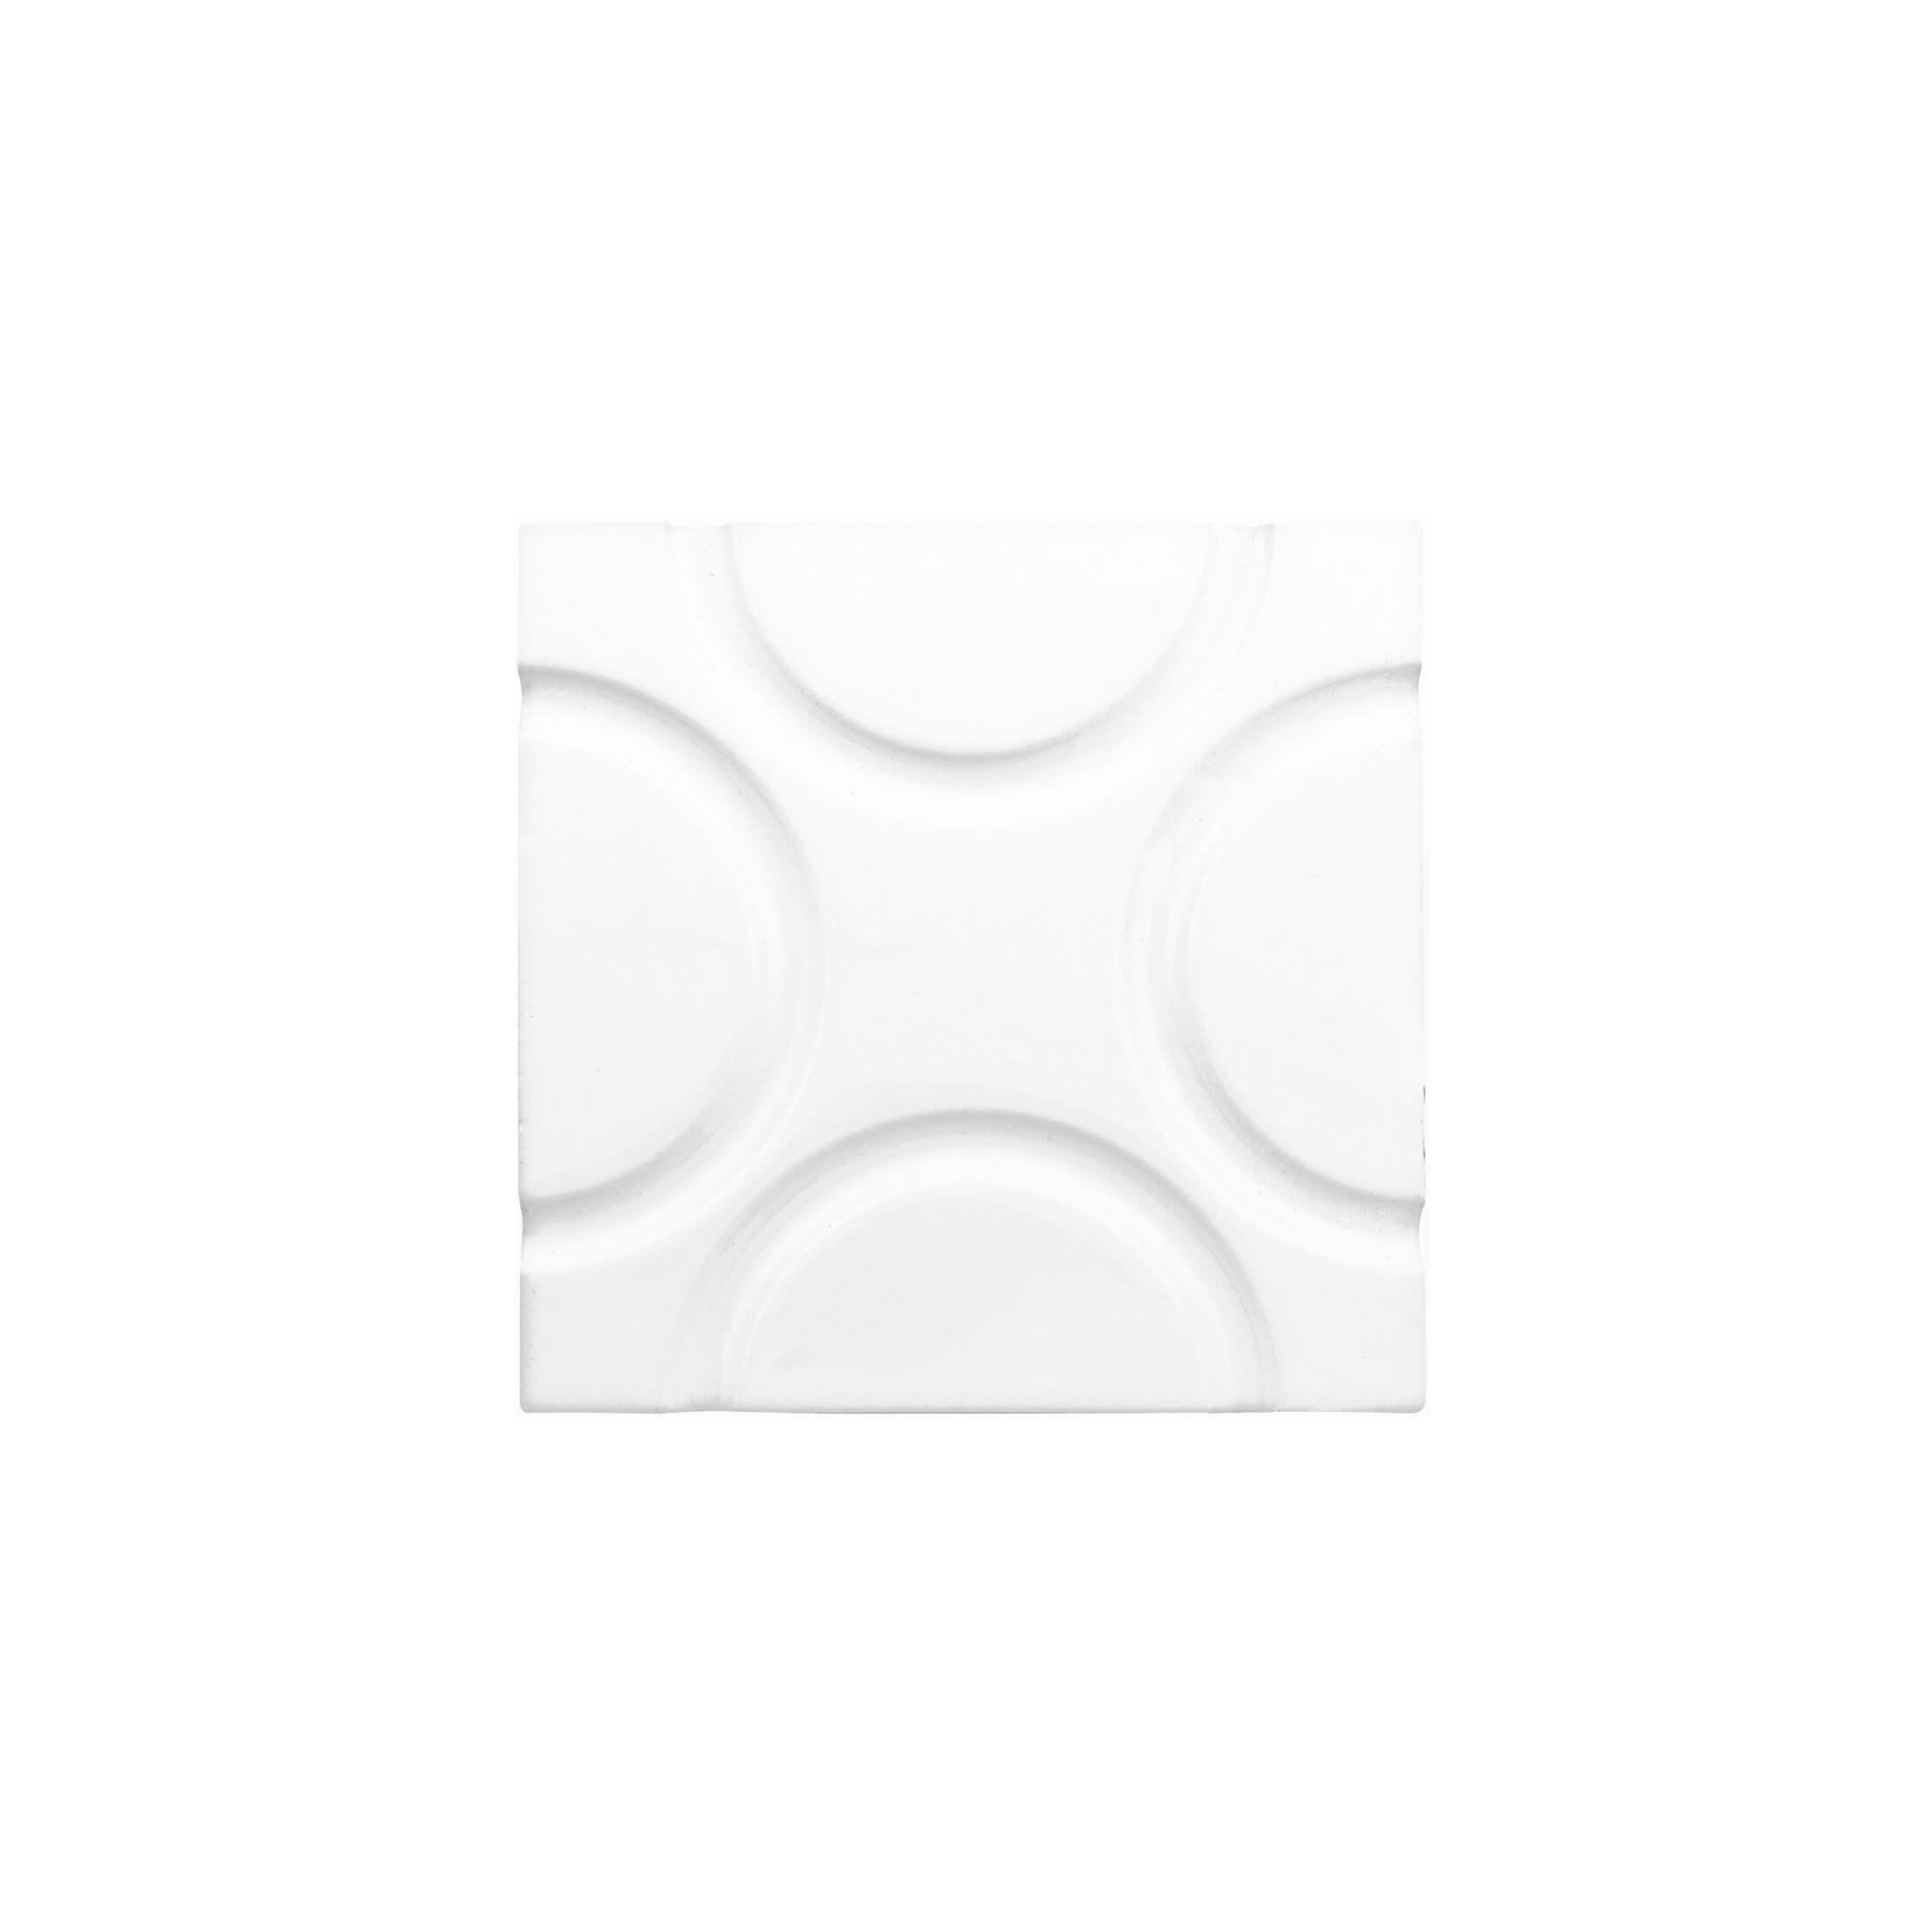 ADNE4128 - LISO GEO - 15 cm X 15 cm